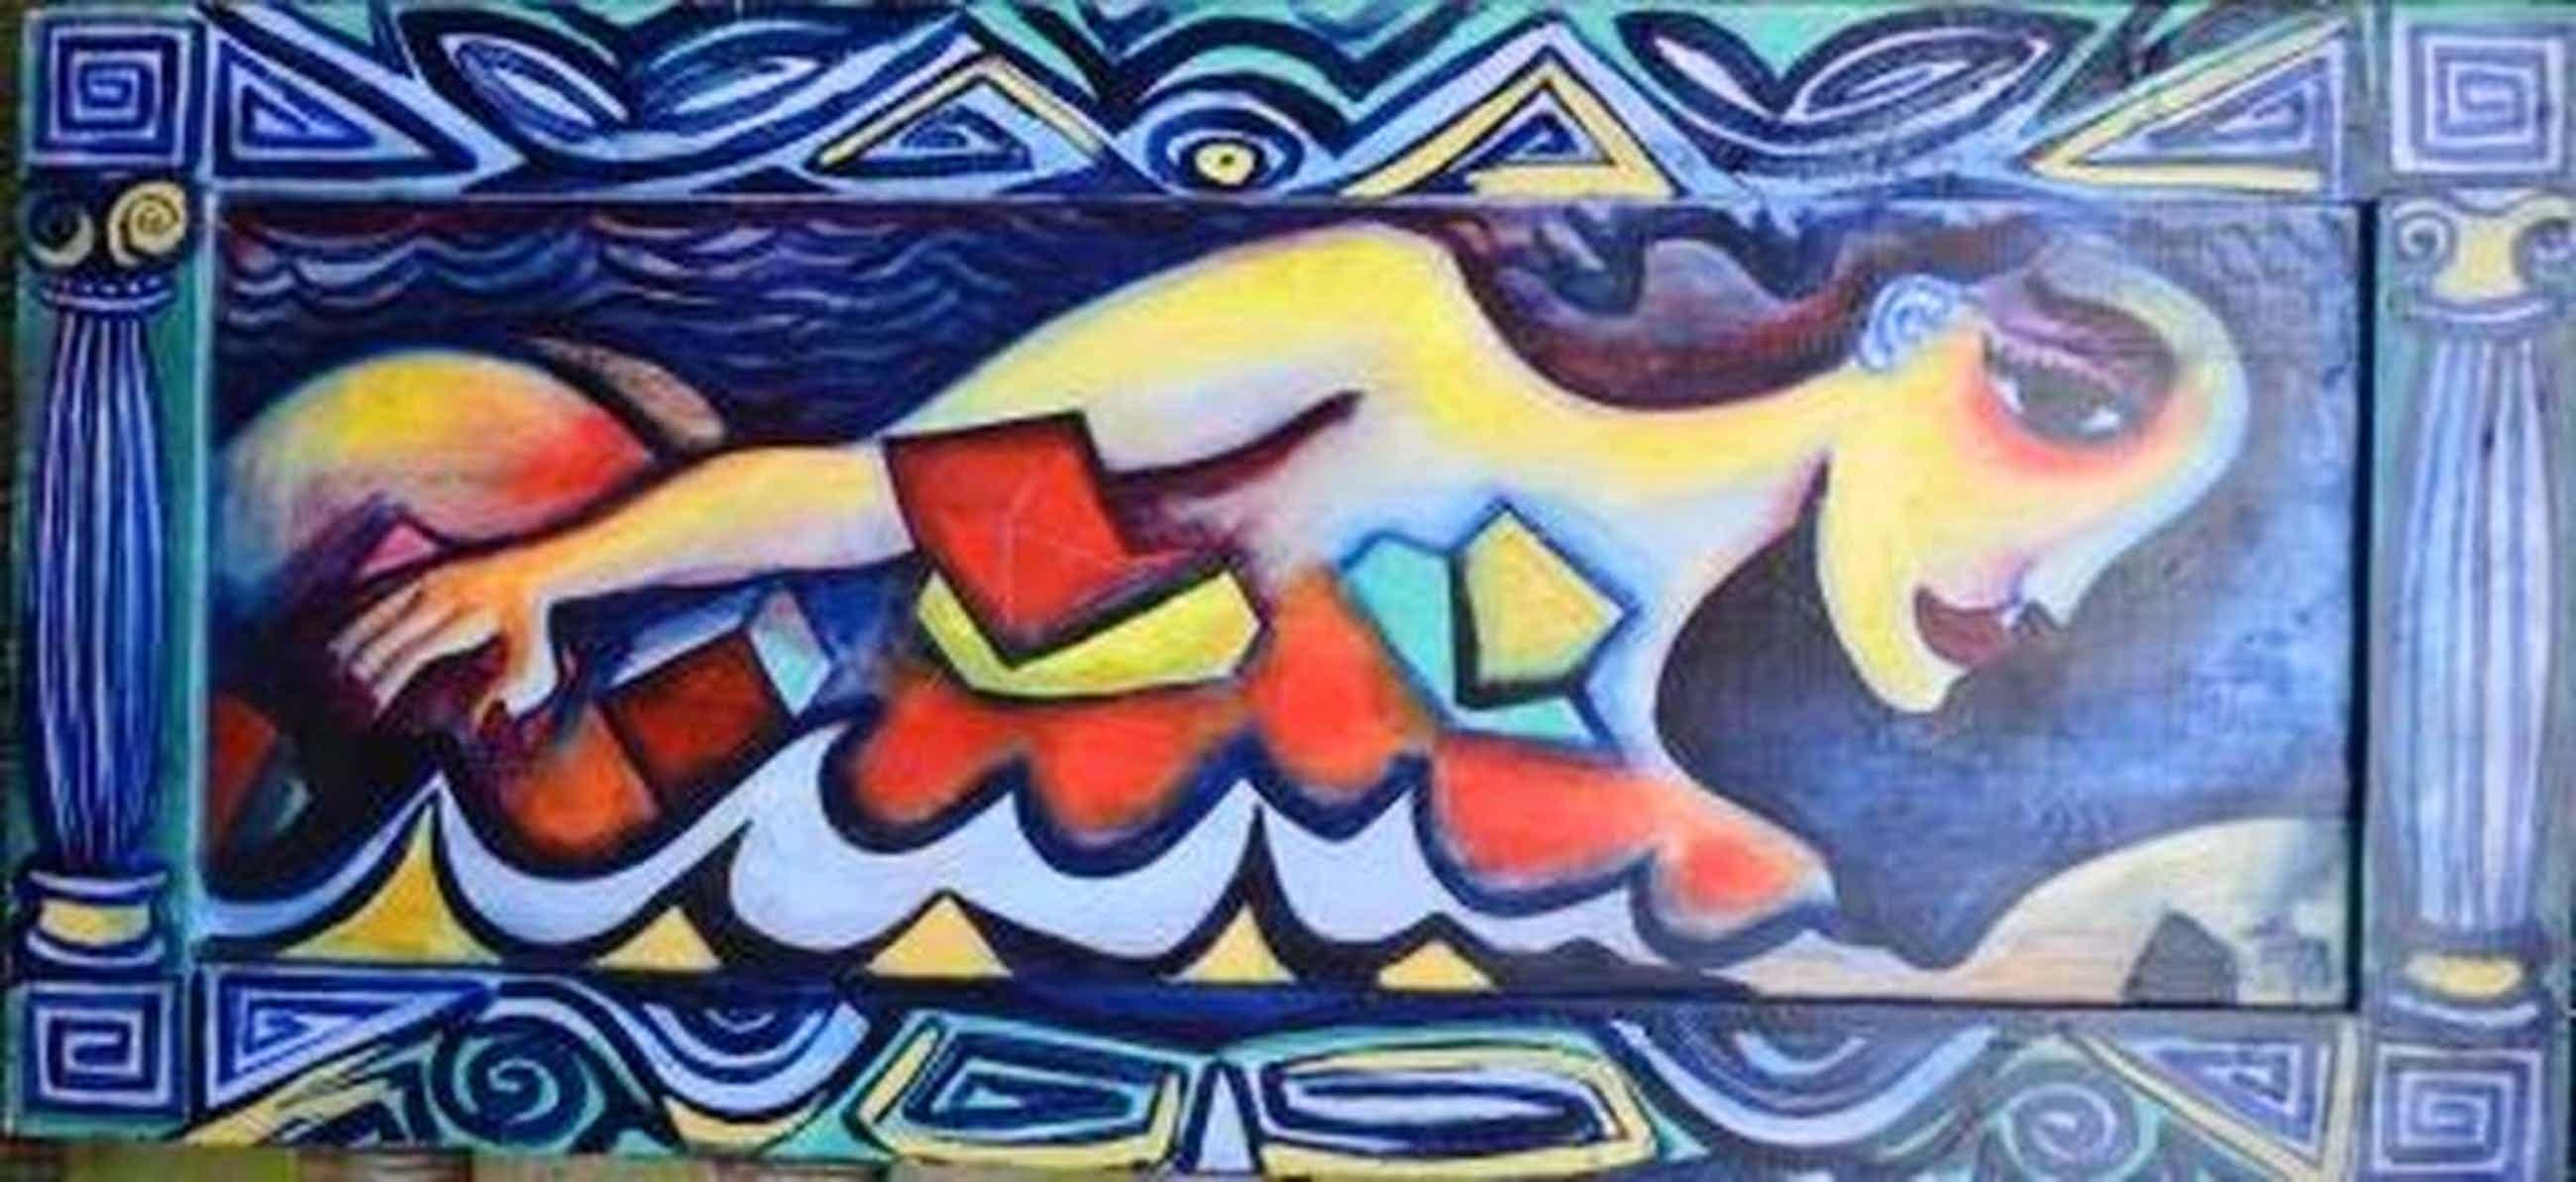 Fabrice Hund ,dé Amsterdamse Kunstenaar - TOPWERK uit 1978 -  150x76 kopen? Bied vanaf 800!